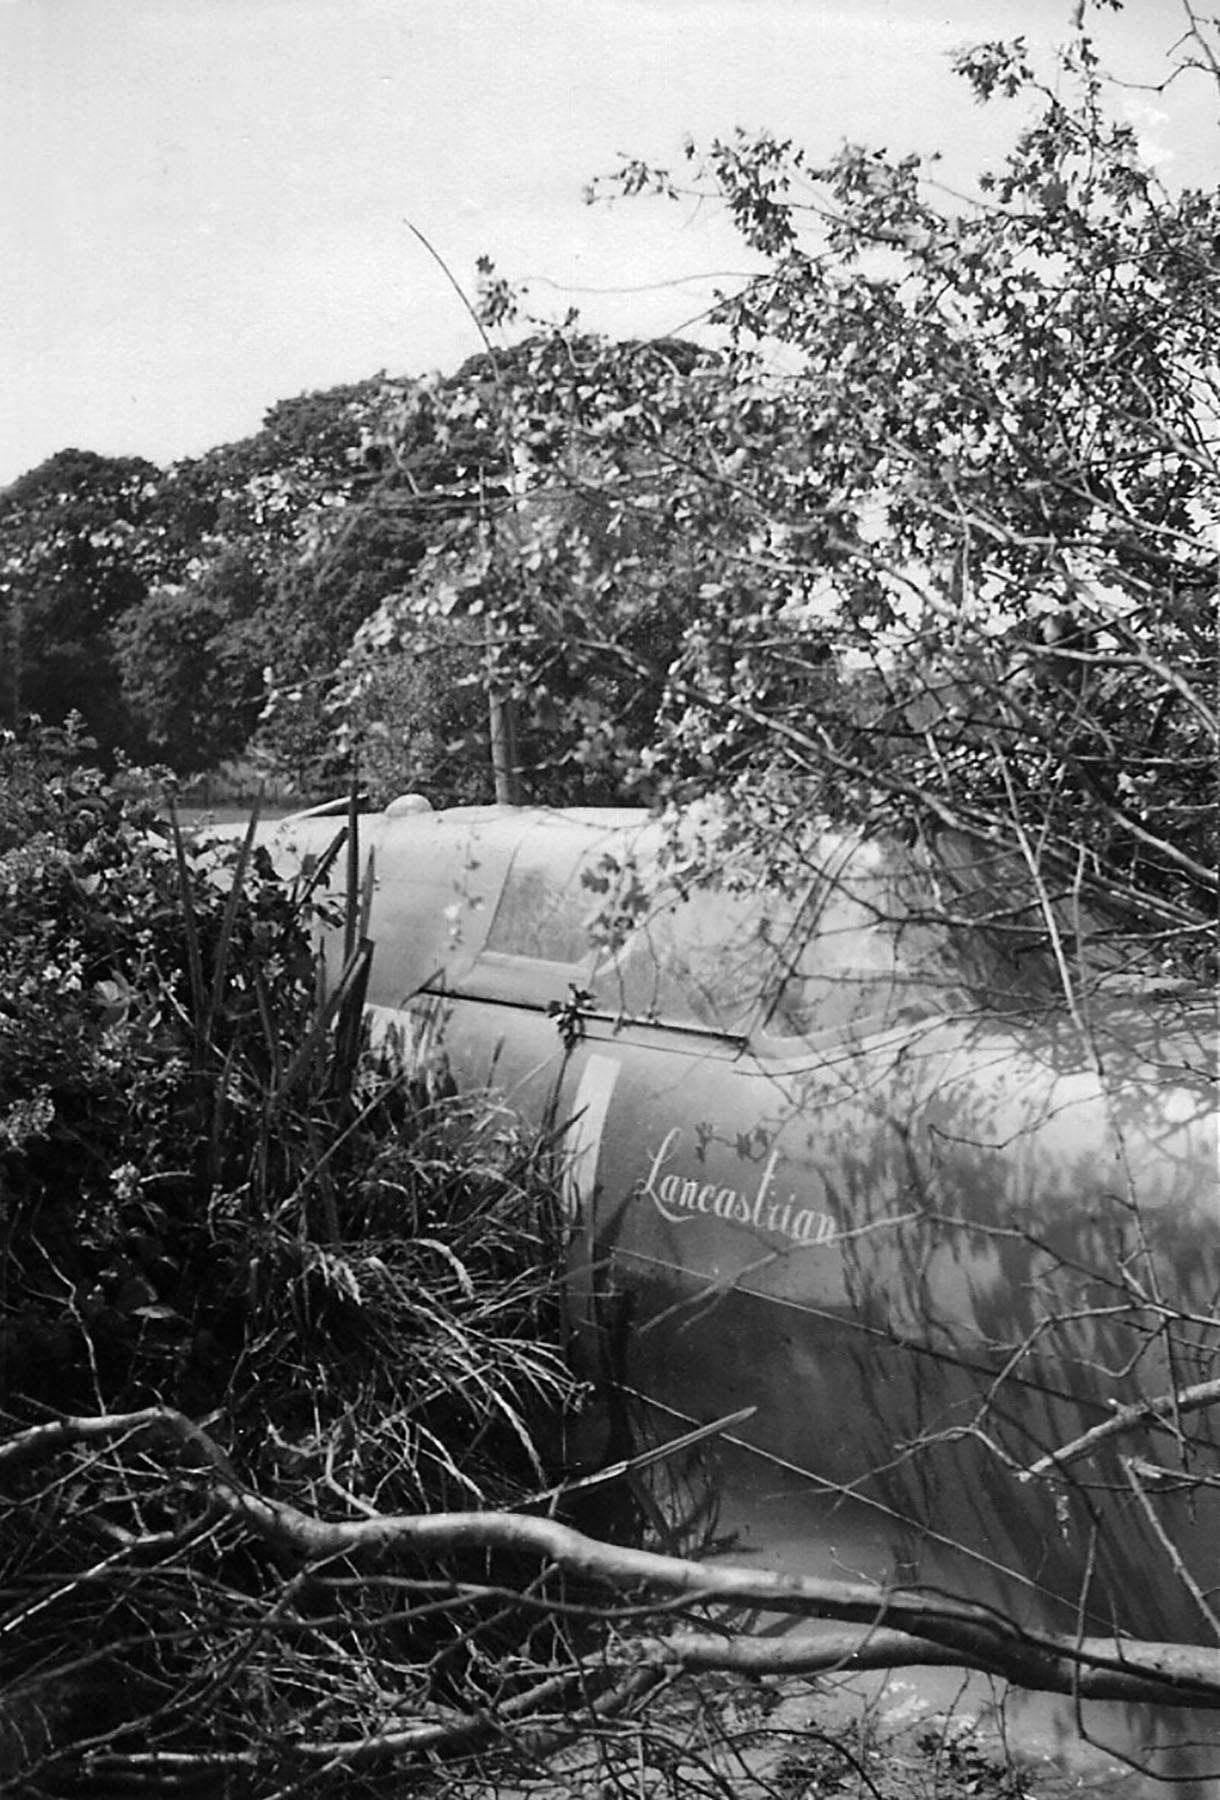 Spitfire MkVb RAF 92Sqn QJB Clive Wawn Lancastrian W3410 Beachy Head 01